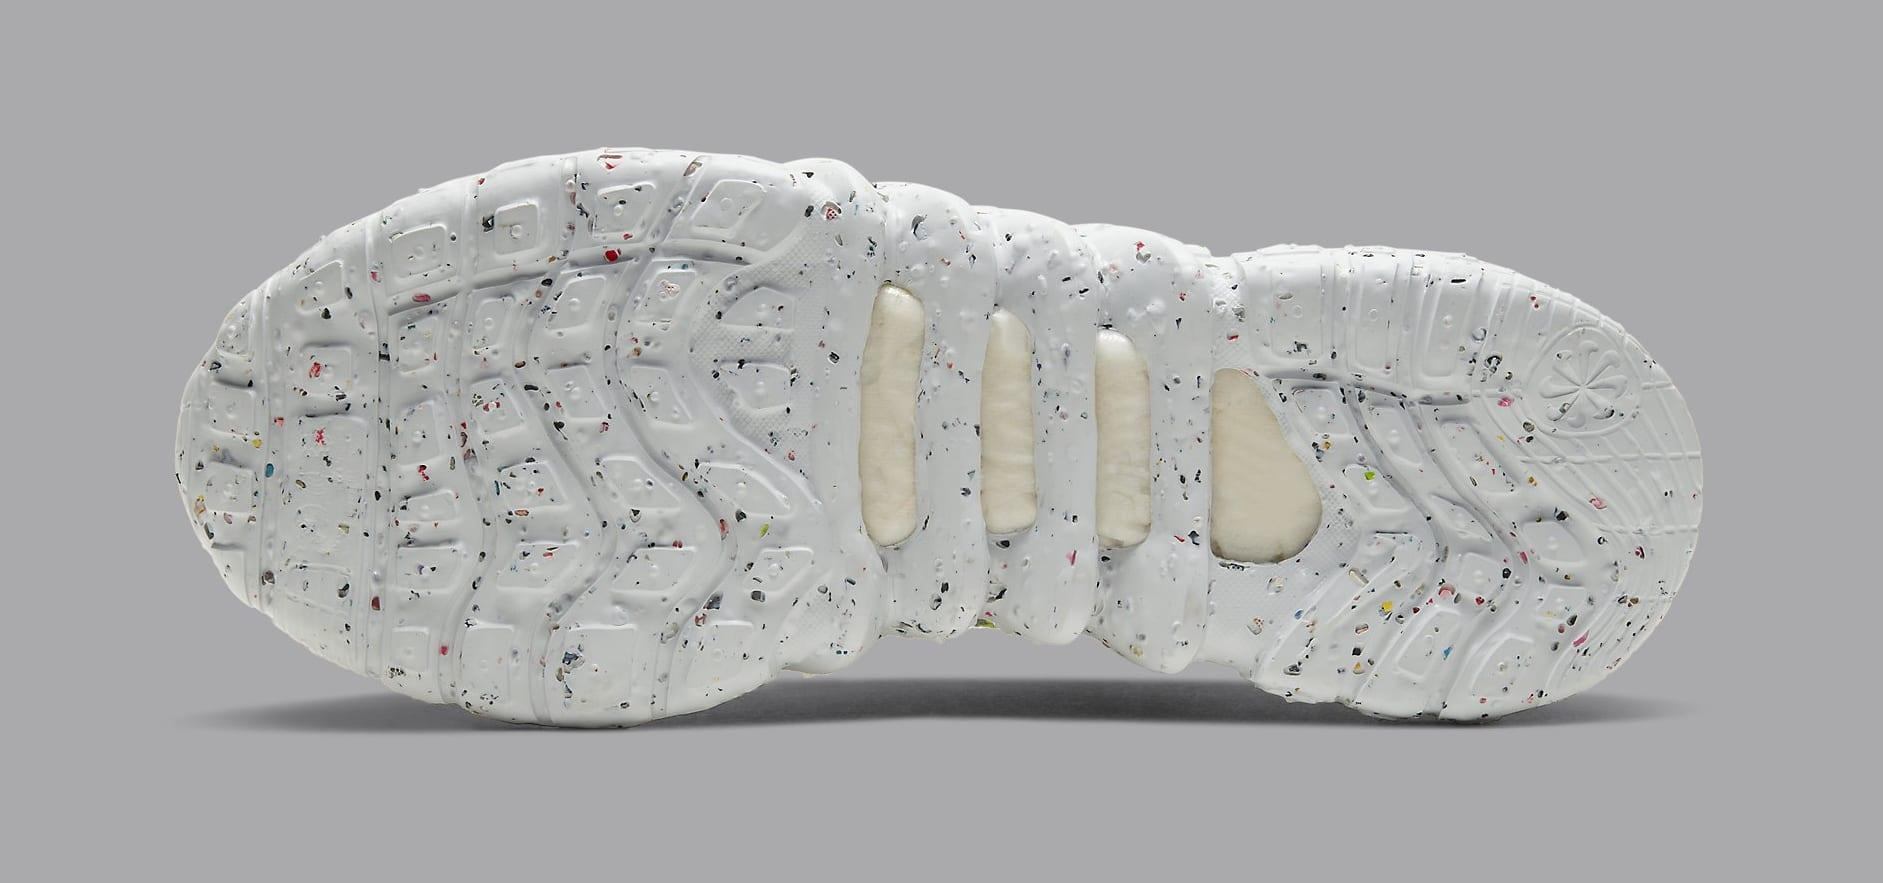 Nike Space Hippie 01 'Grey/Volt' CQ3986-002 Outsole